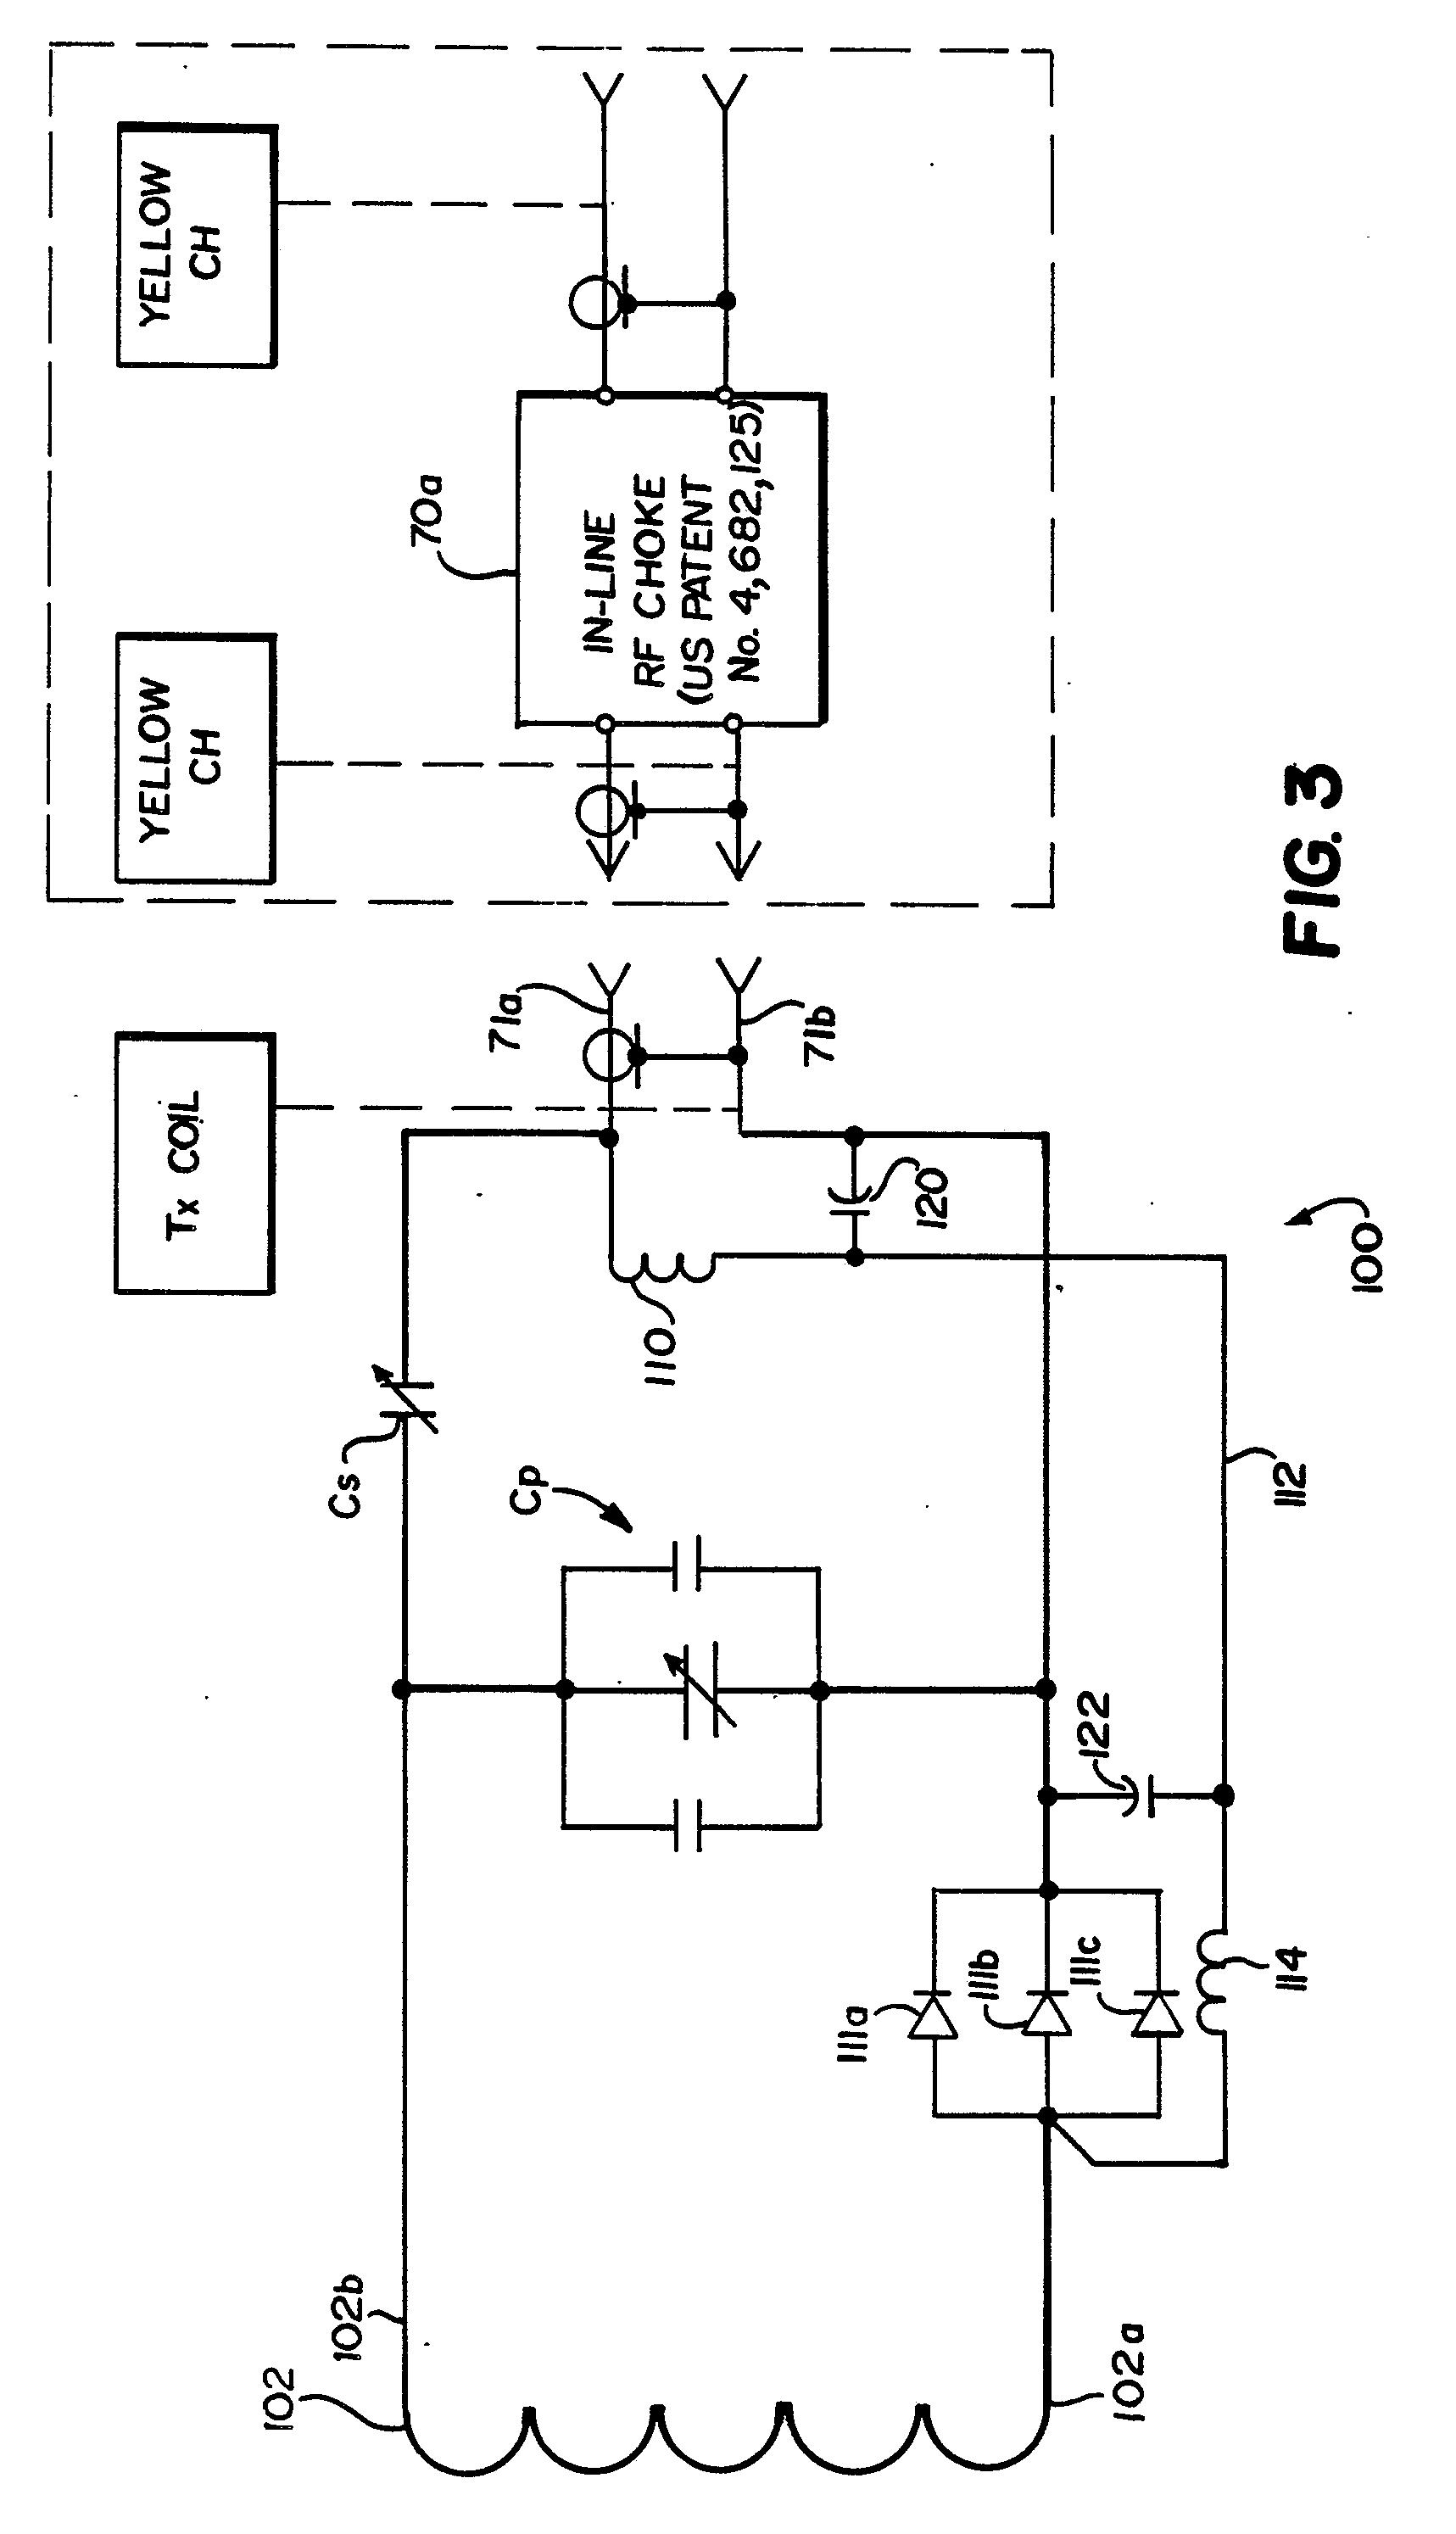 siemens g120 wiring diagram er model in dbms mri epo  crackthecode co